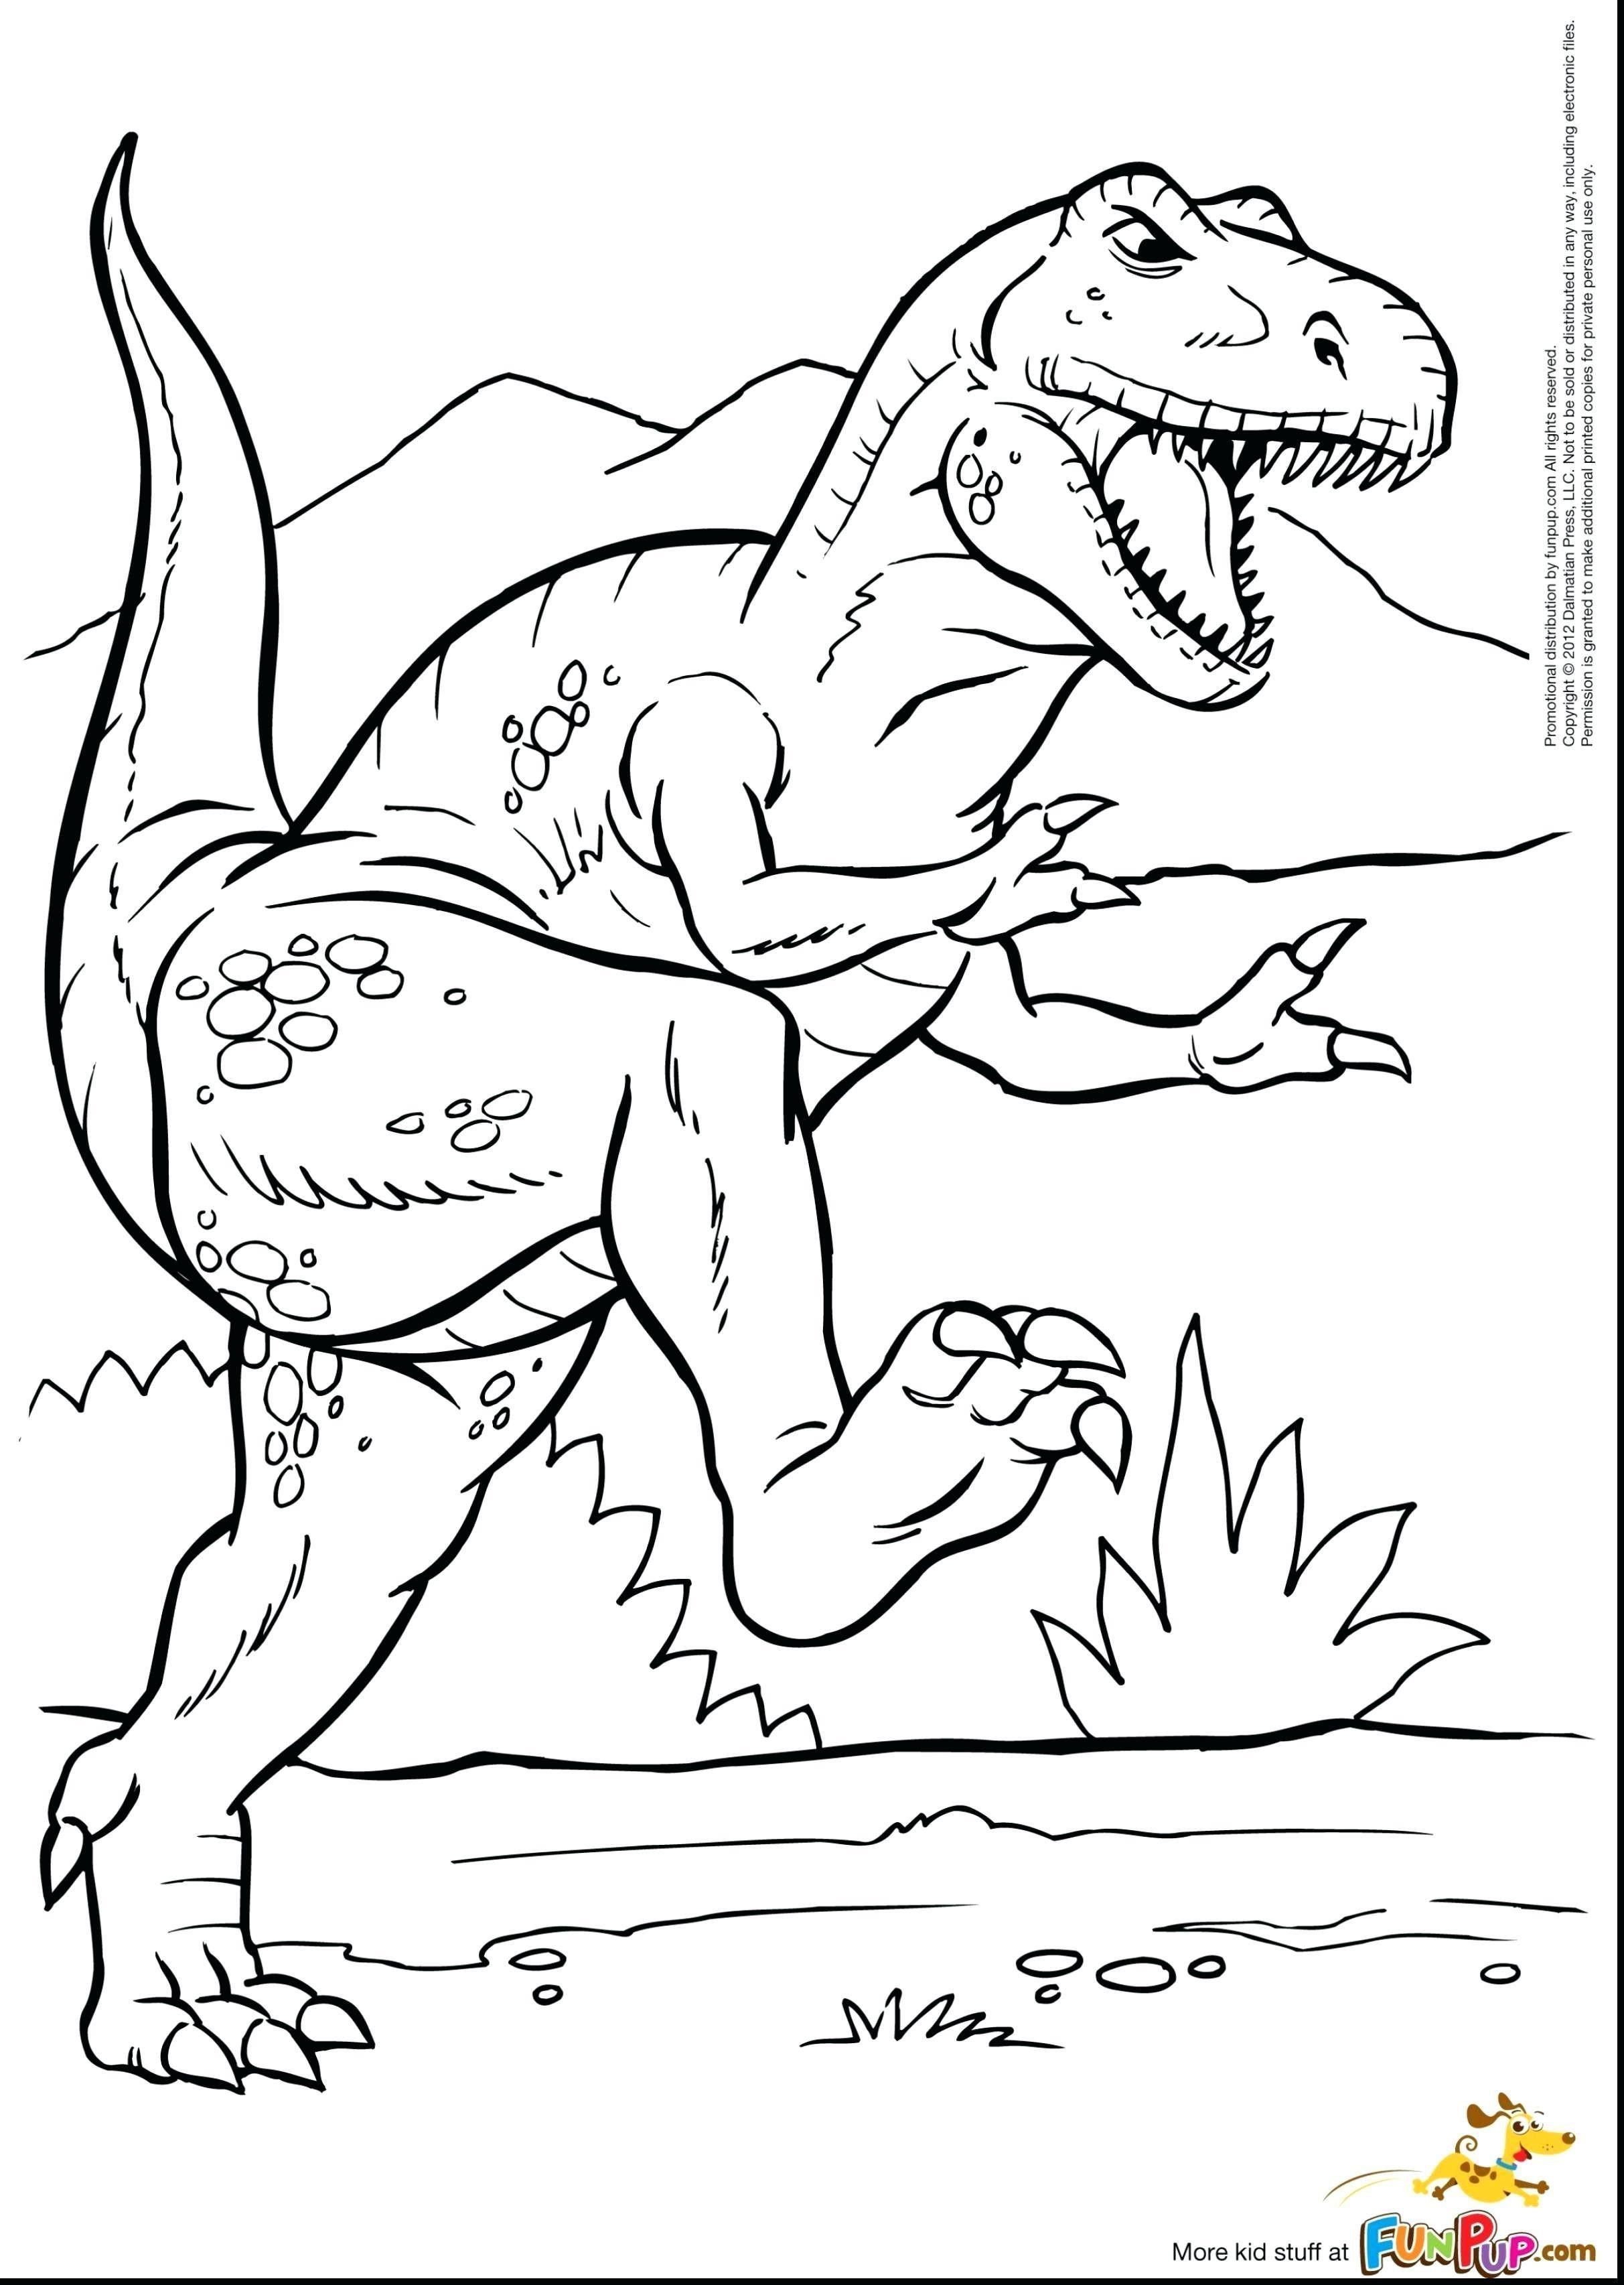 Coloringforkids Info Dinosaur Coloring Sheets Dinosaur Coloring Pages Coloring Pages